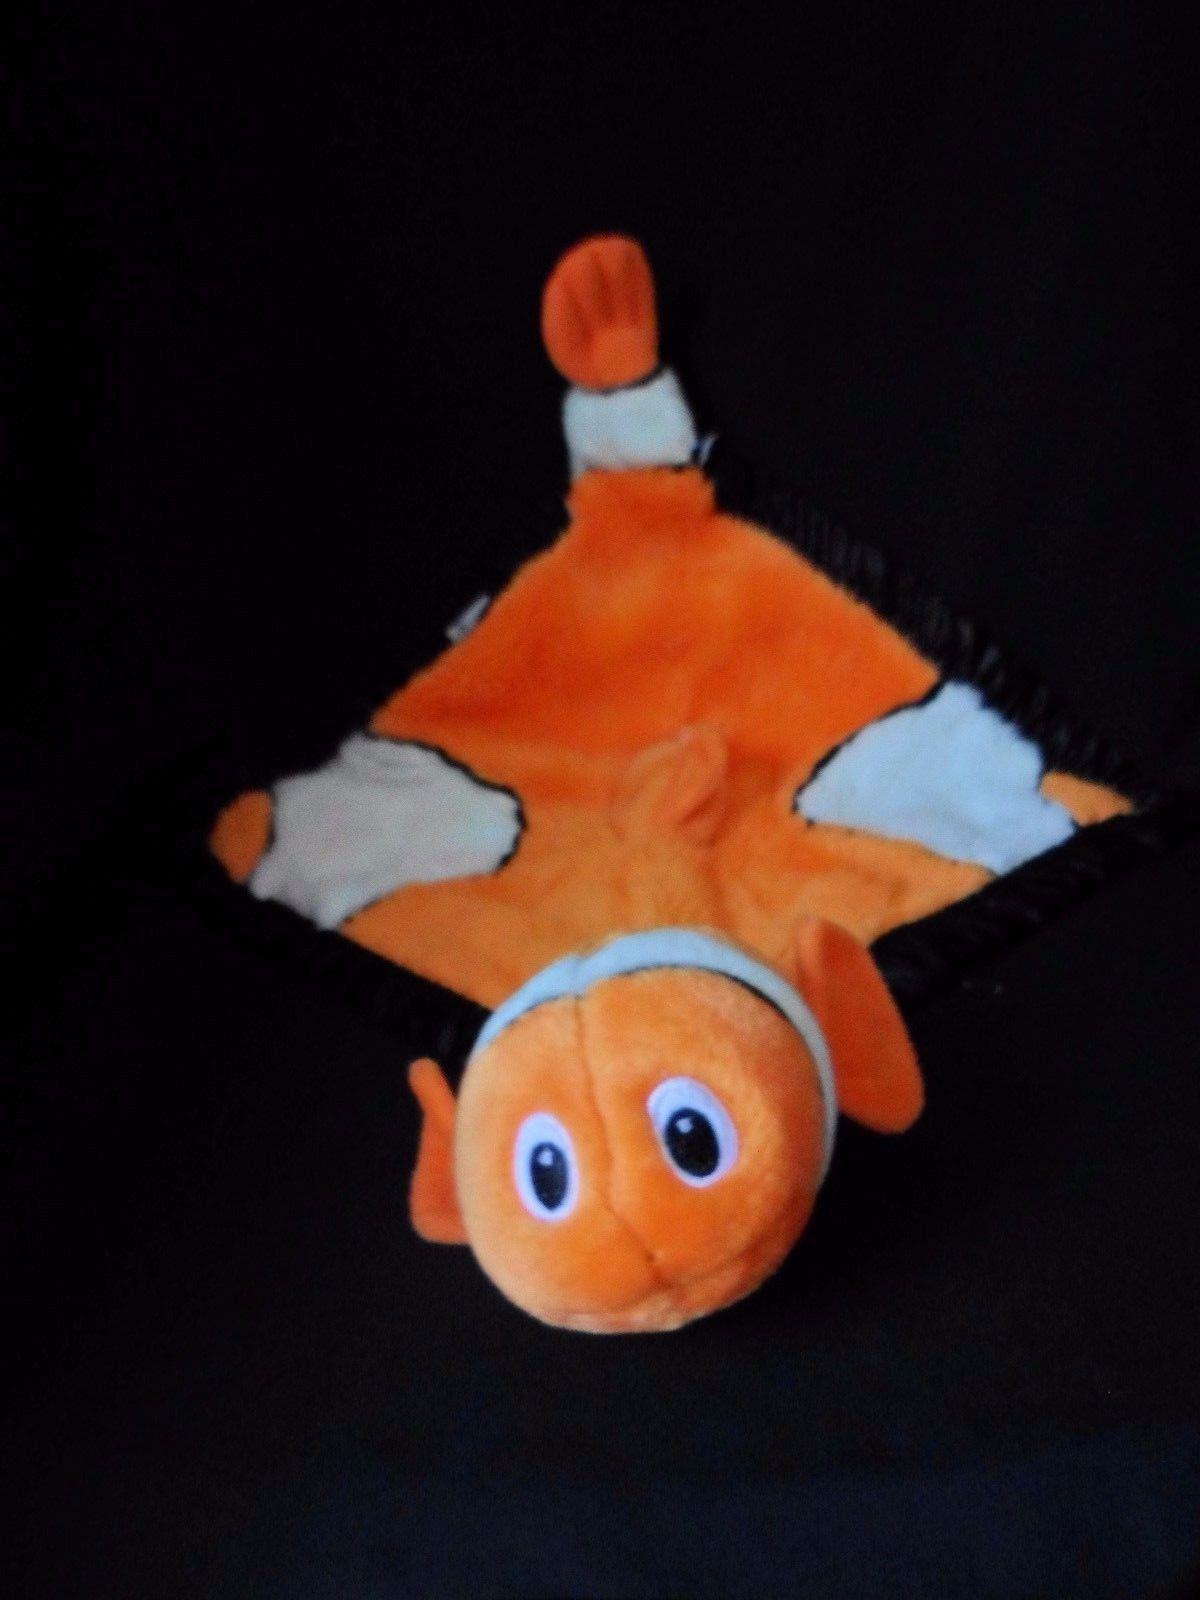 My Banky Orange Black Plush Clown Fish and 50 similar items